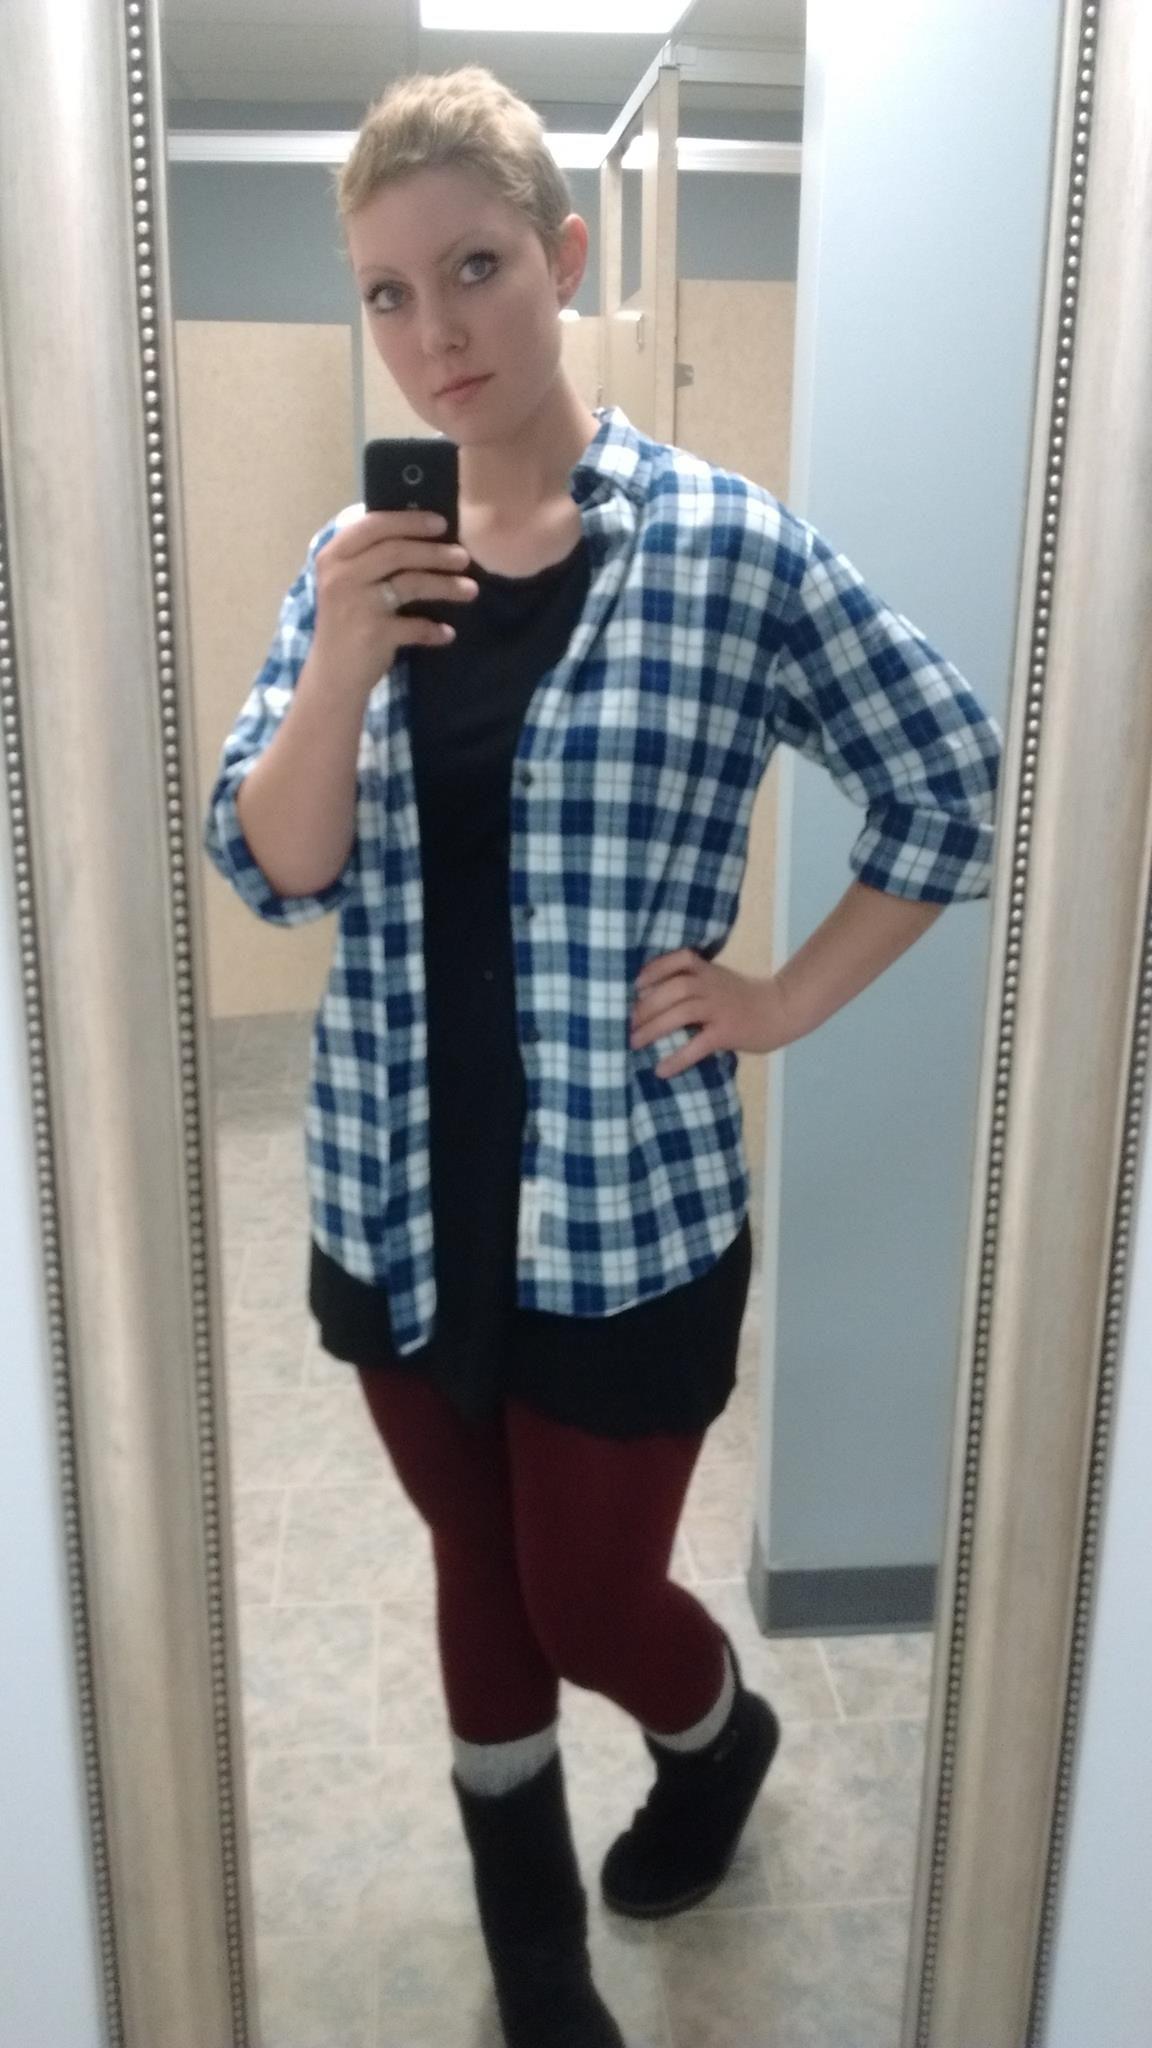 Flannel Shirt Leggings Boots Winter Style Short Hair Trendy Little Black Dress Leg Warmers Clothes Women S Plaid Shirt Flannel Shirt [ 2048 x 1152 Pixel ]